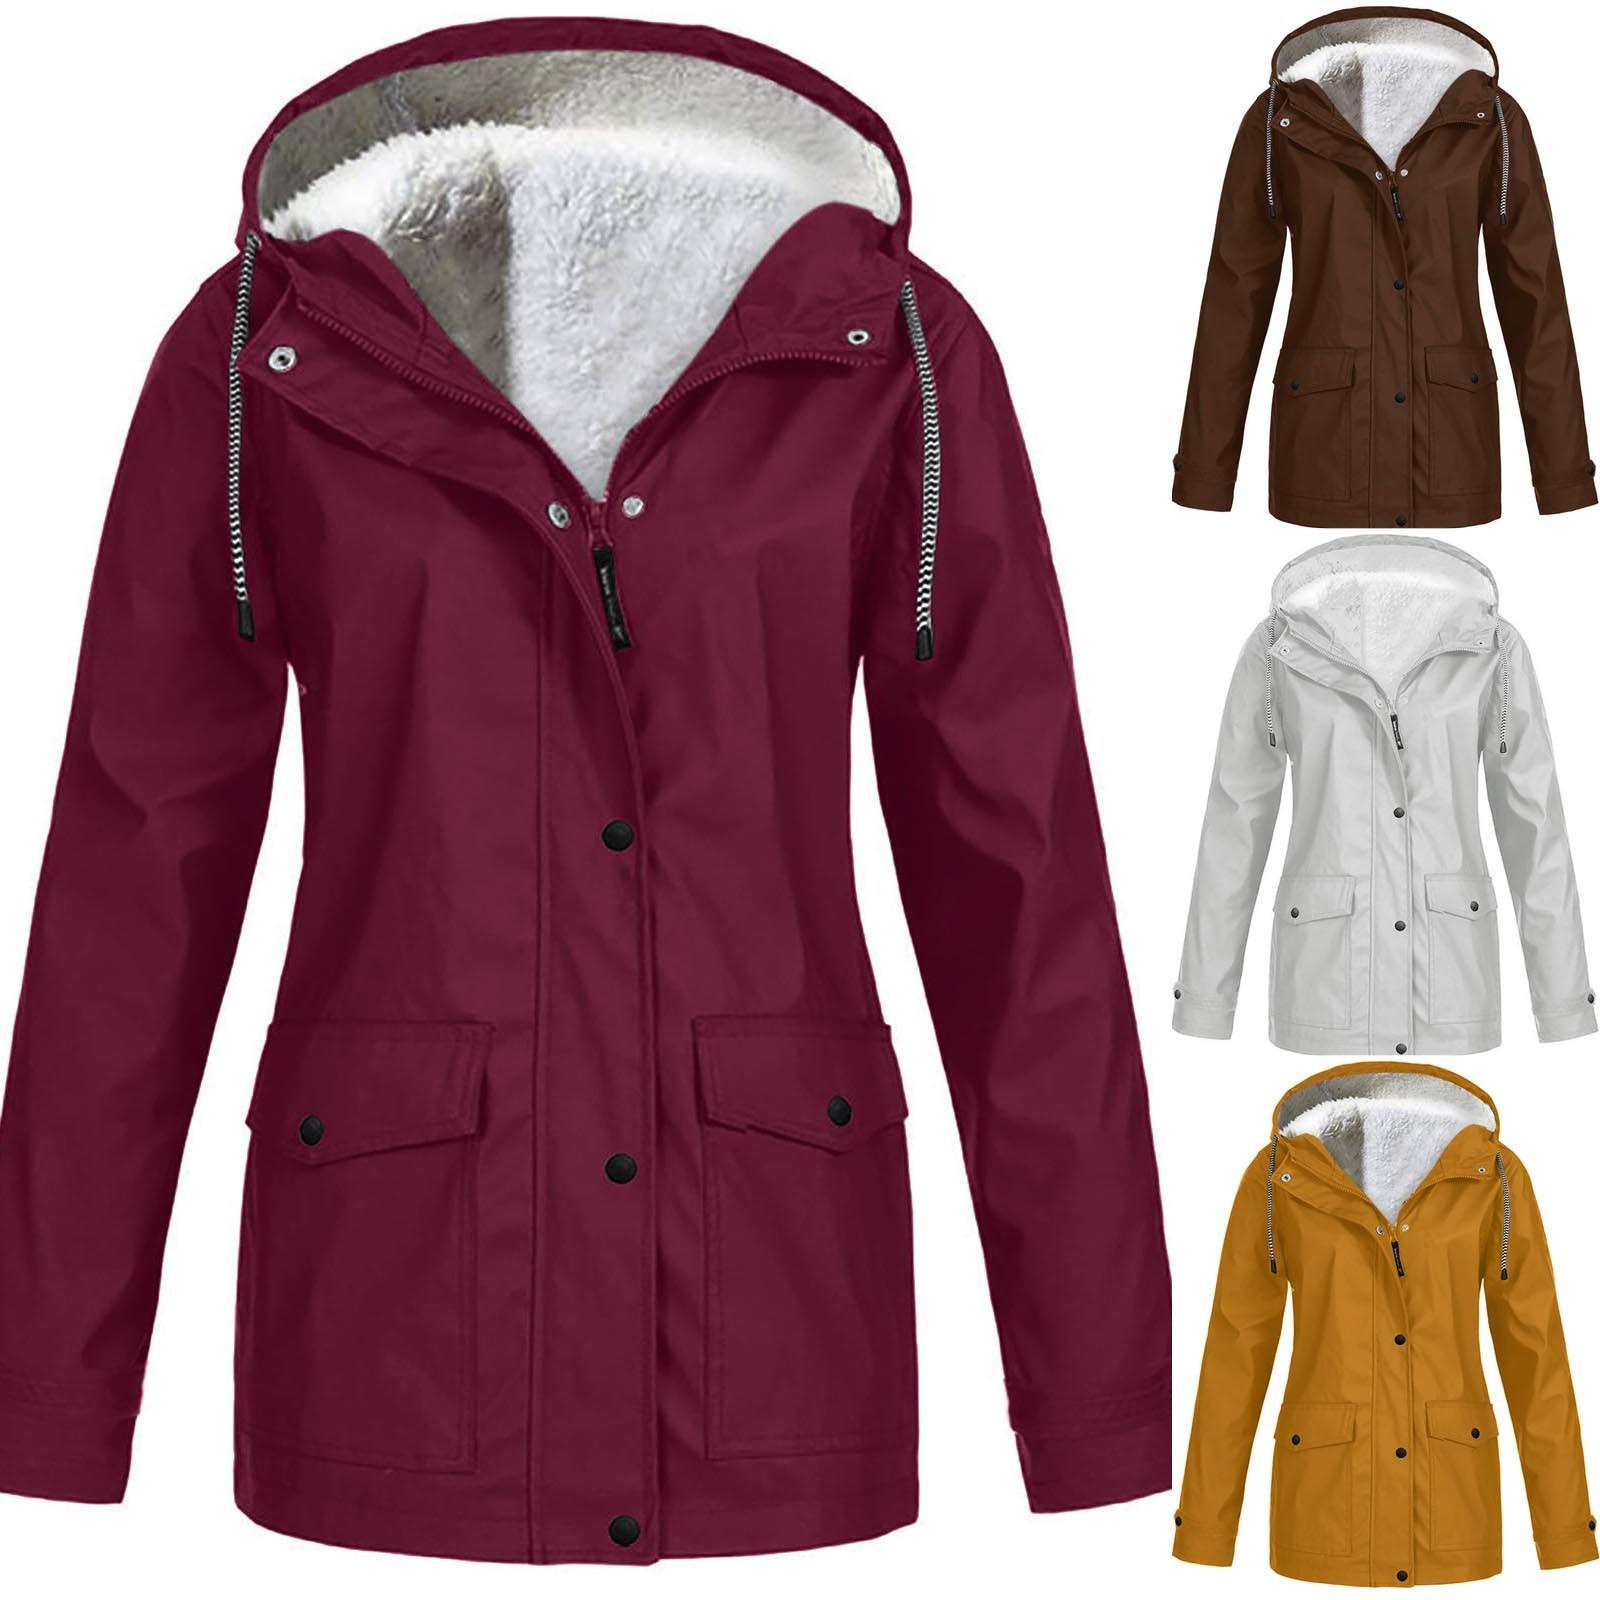 Women Solid Plush Rain Outdoor Plus Size Hooded Raincoat Windproof Jacket Coat Vetement Femme Woman